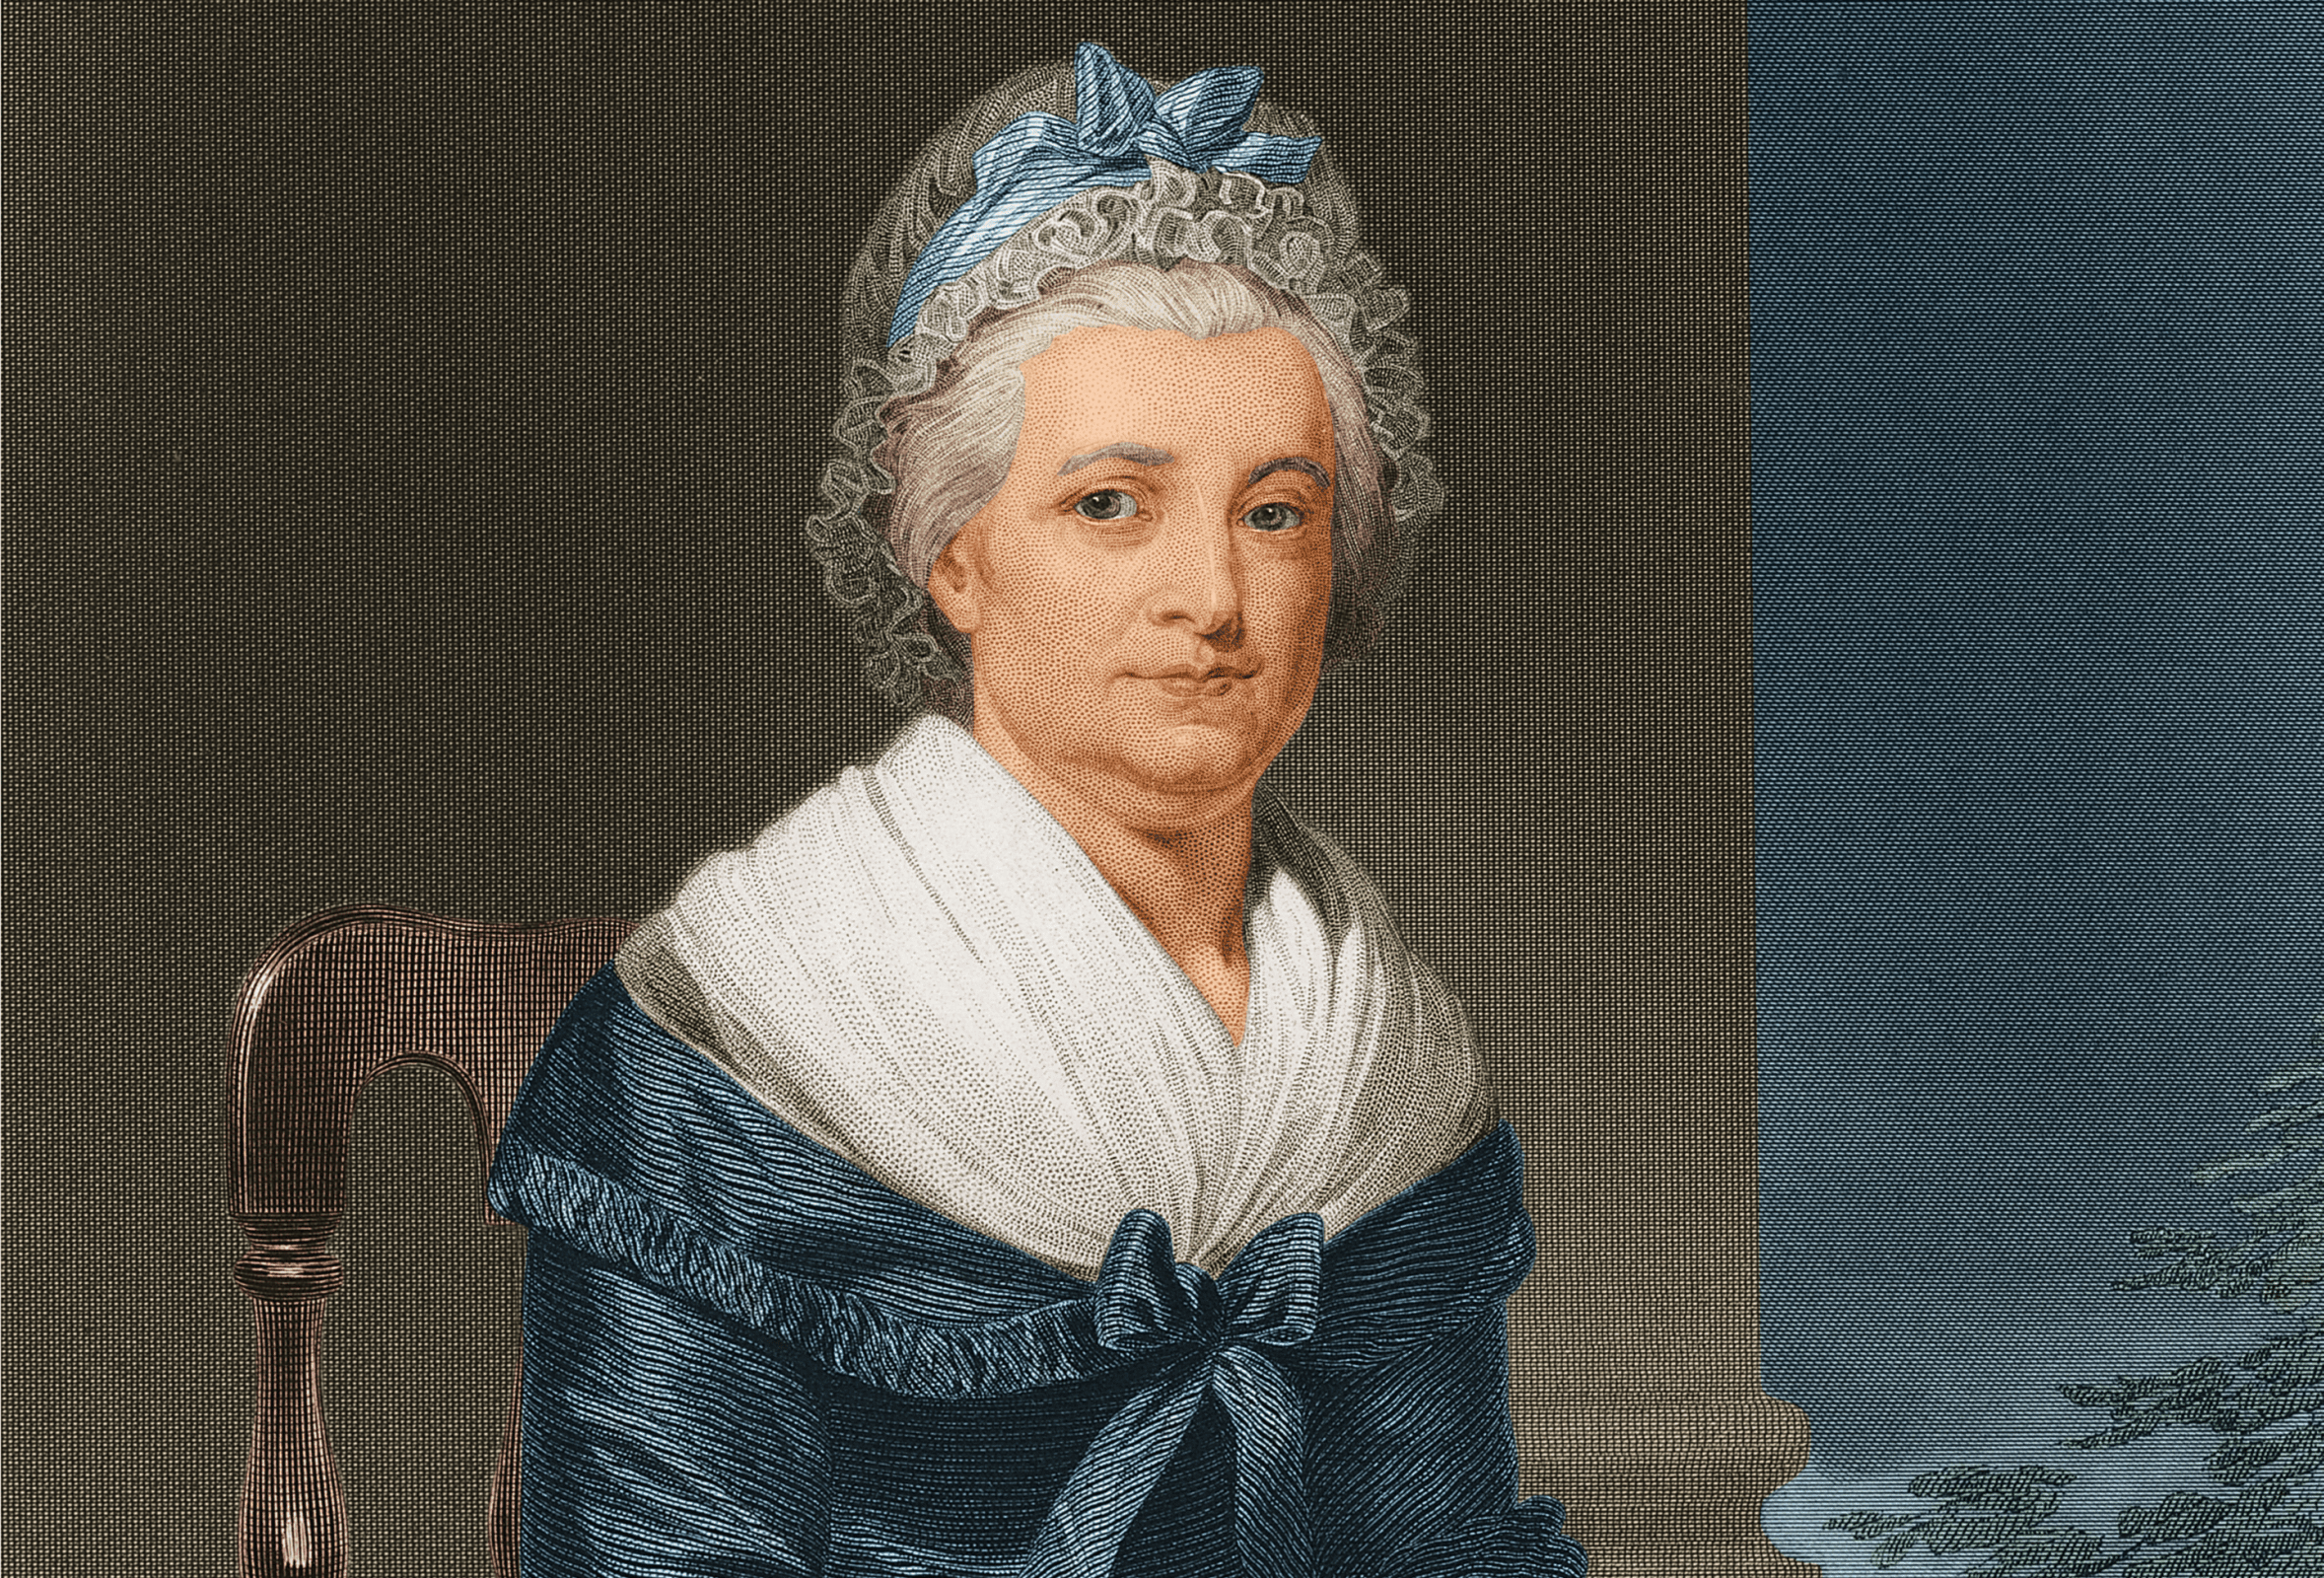 10 Key Facts About George Washington